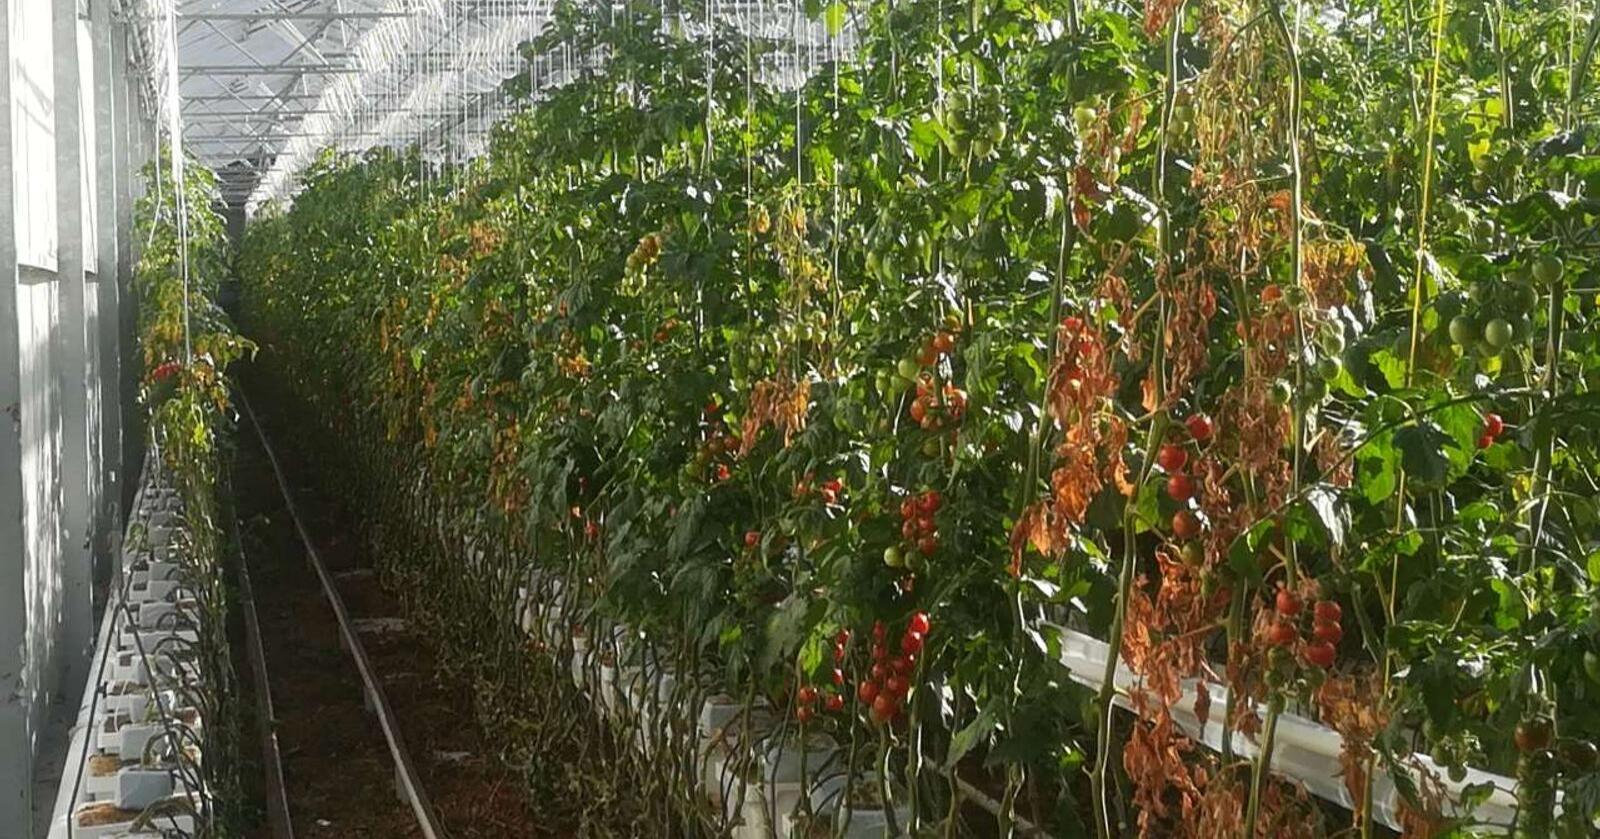 Planter med begynnende skade av tomatbrunflekkvirus.Foto: Chamber of Northrhine Westfali / Köln, Tyskland